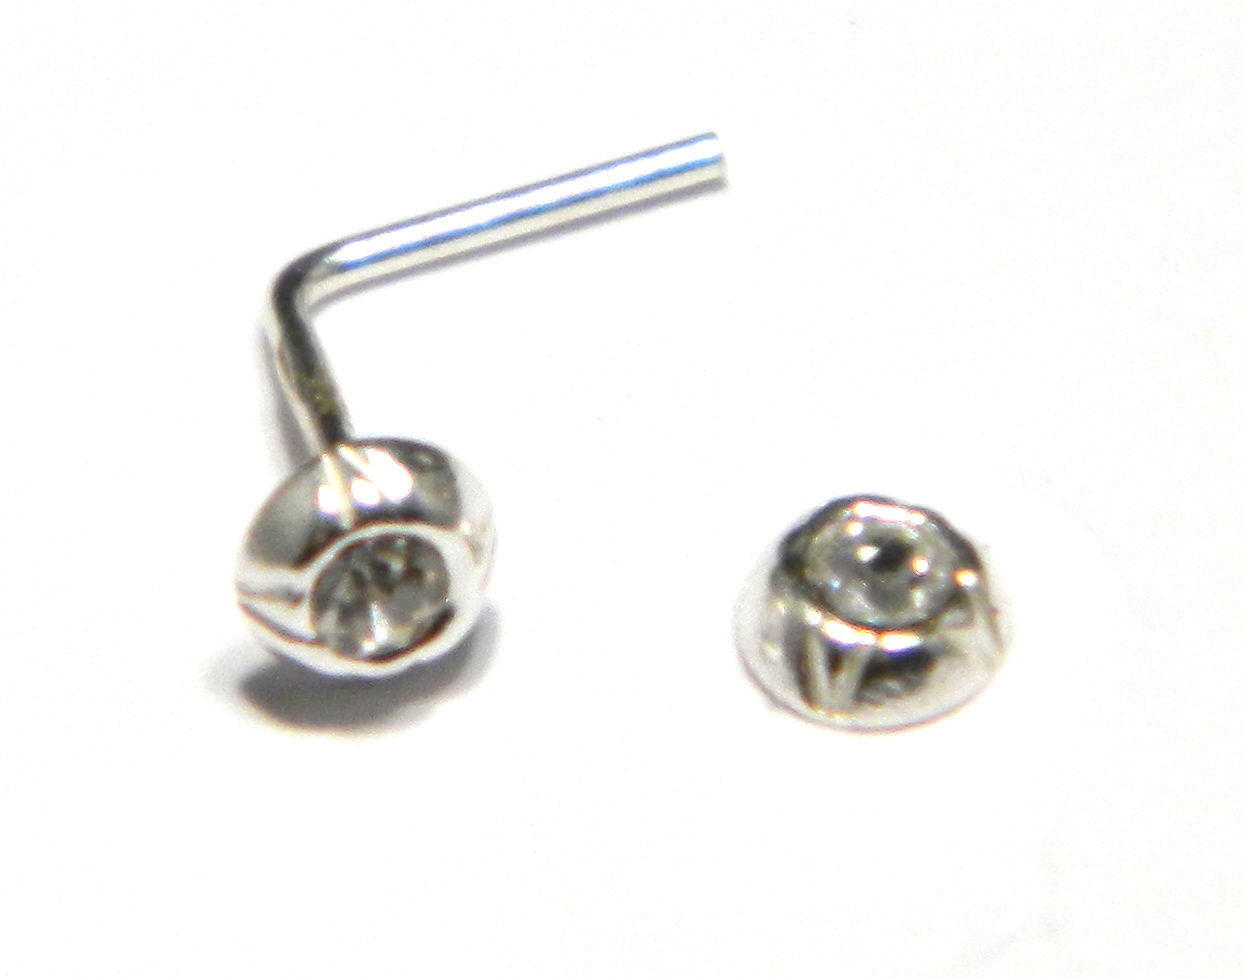 2 mm round austrian crystal inset in 925 sterling silver. Black Bedroom Furniture Sets. Home Design Ideas